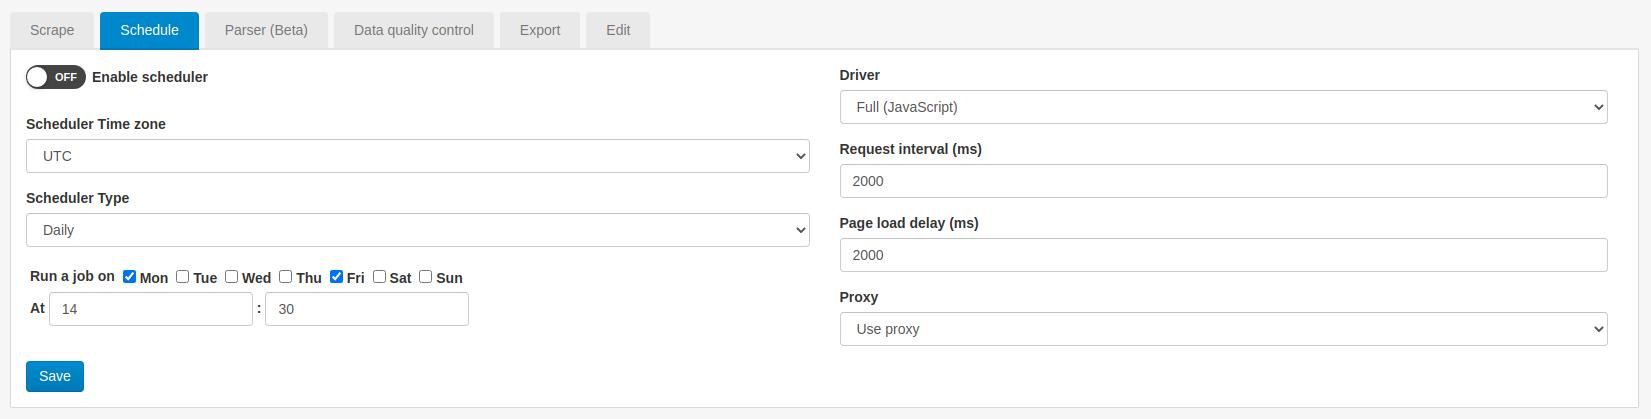 Scheduler-Big-Data-Maintenance-Web-Scraper-Blog